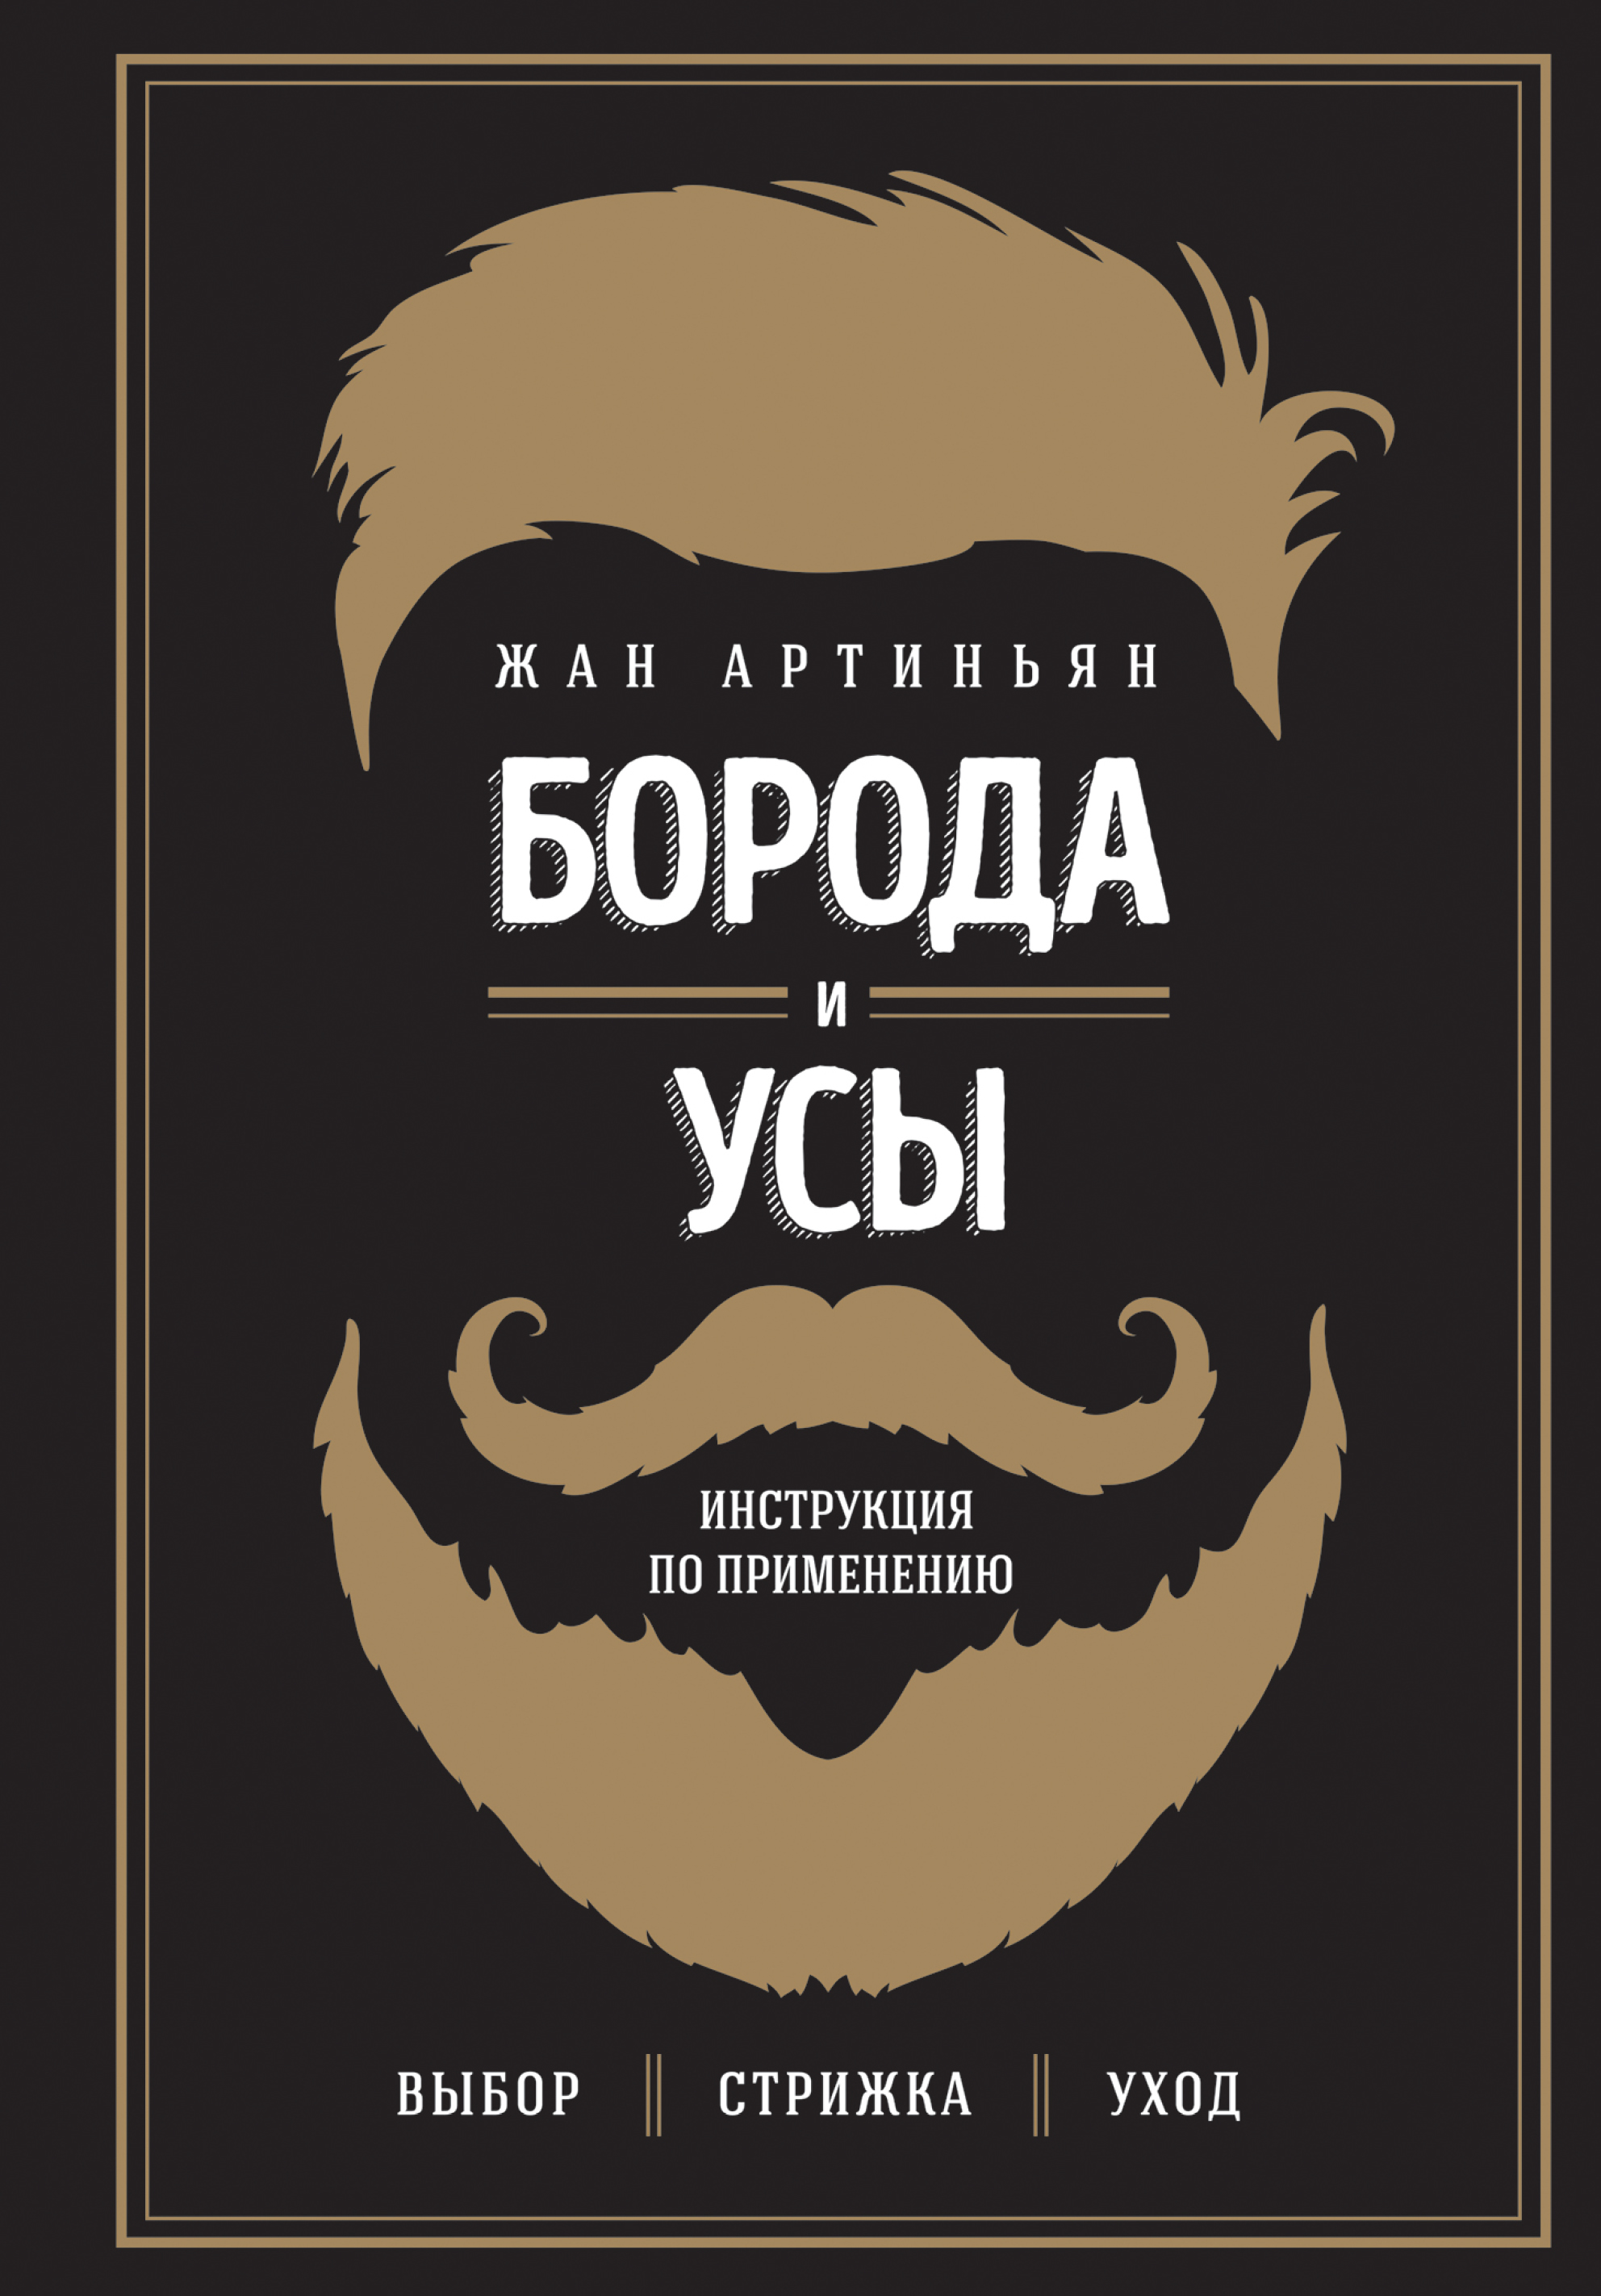 Жан Артиньян Борода и усы. Инструкция по применению цена